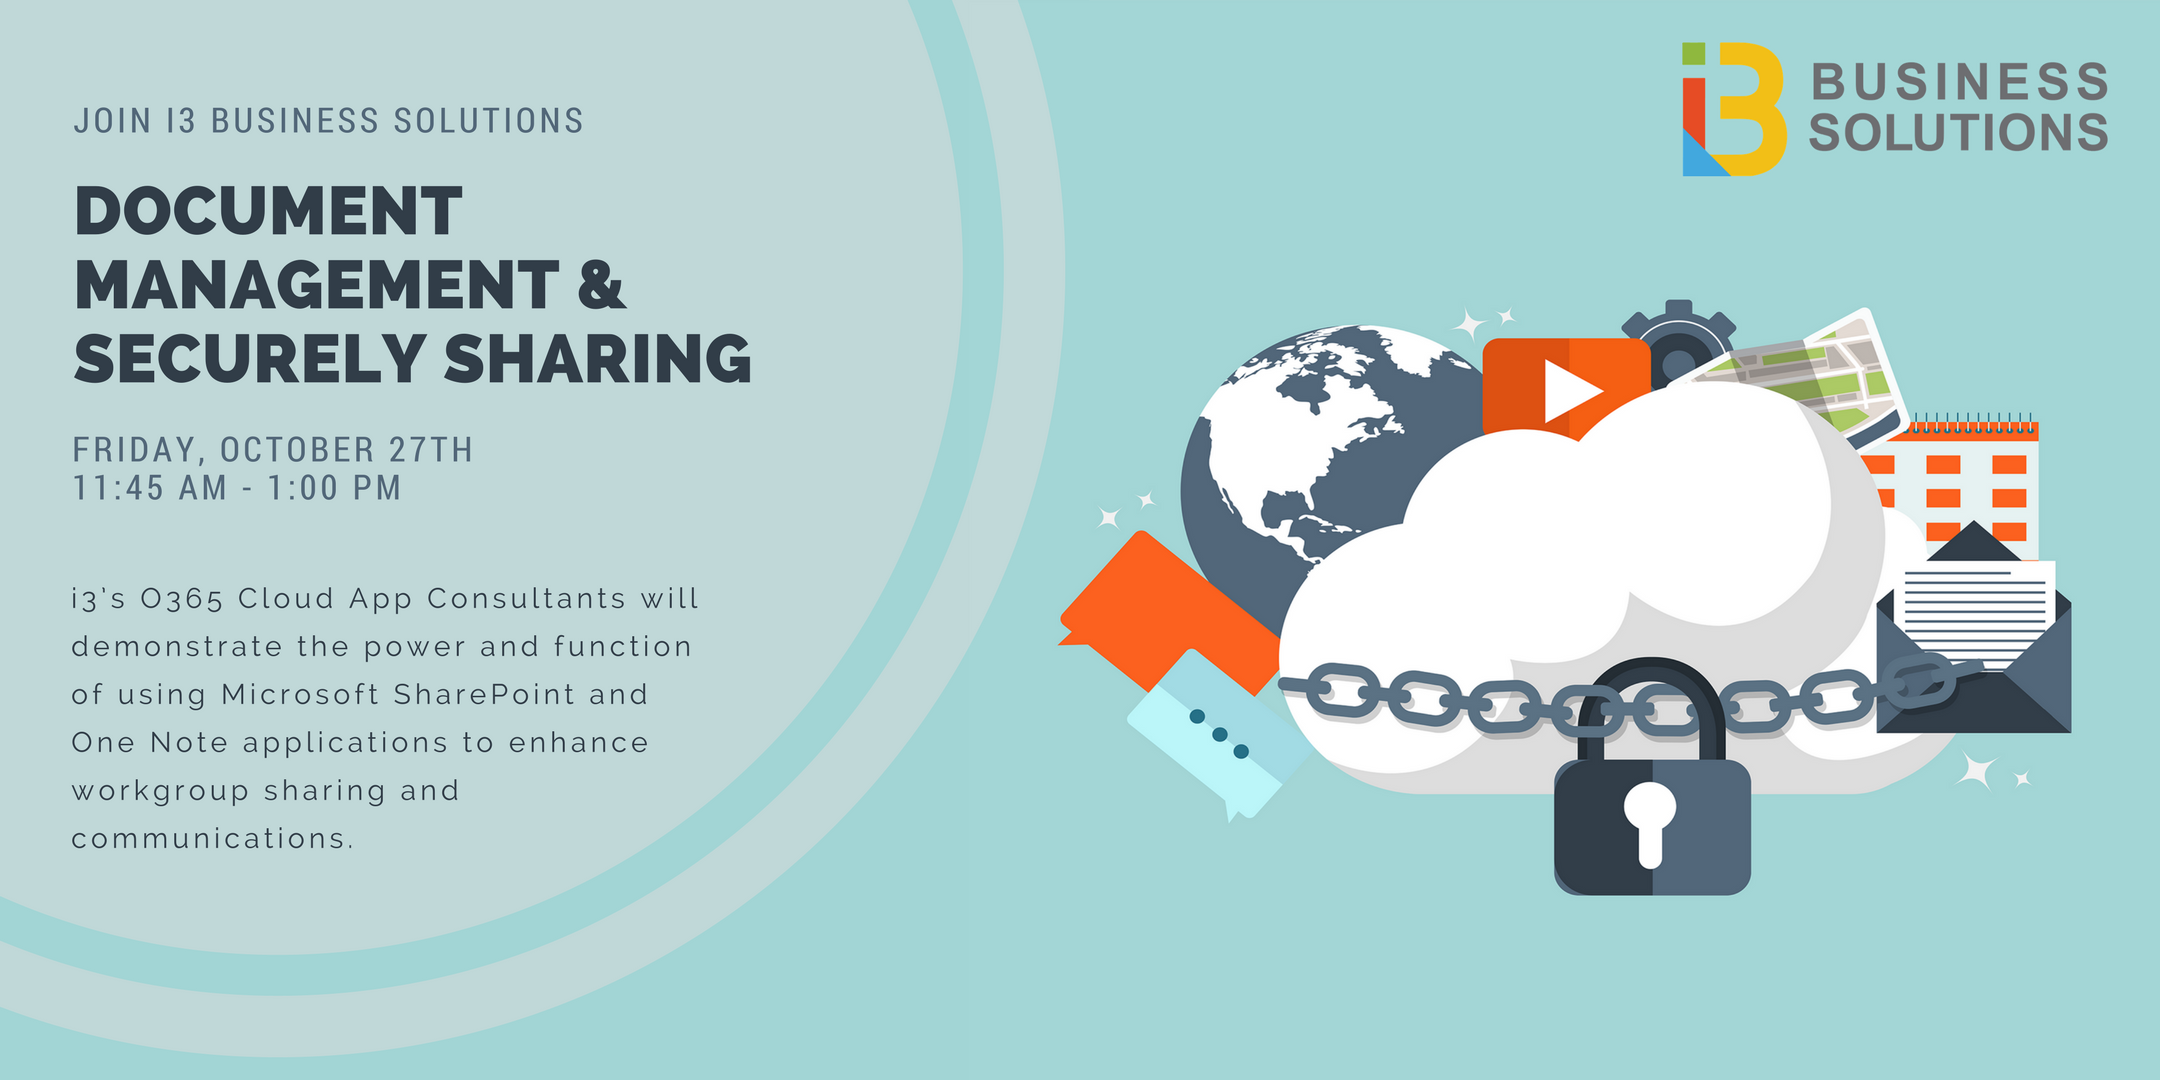 Doument Management & Securely Sharing